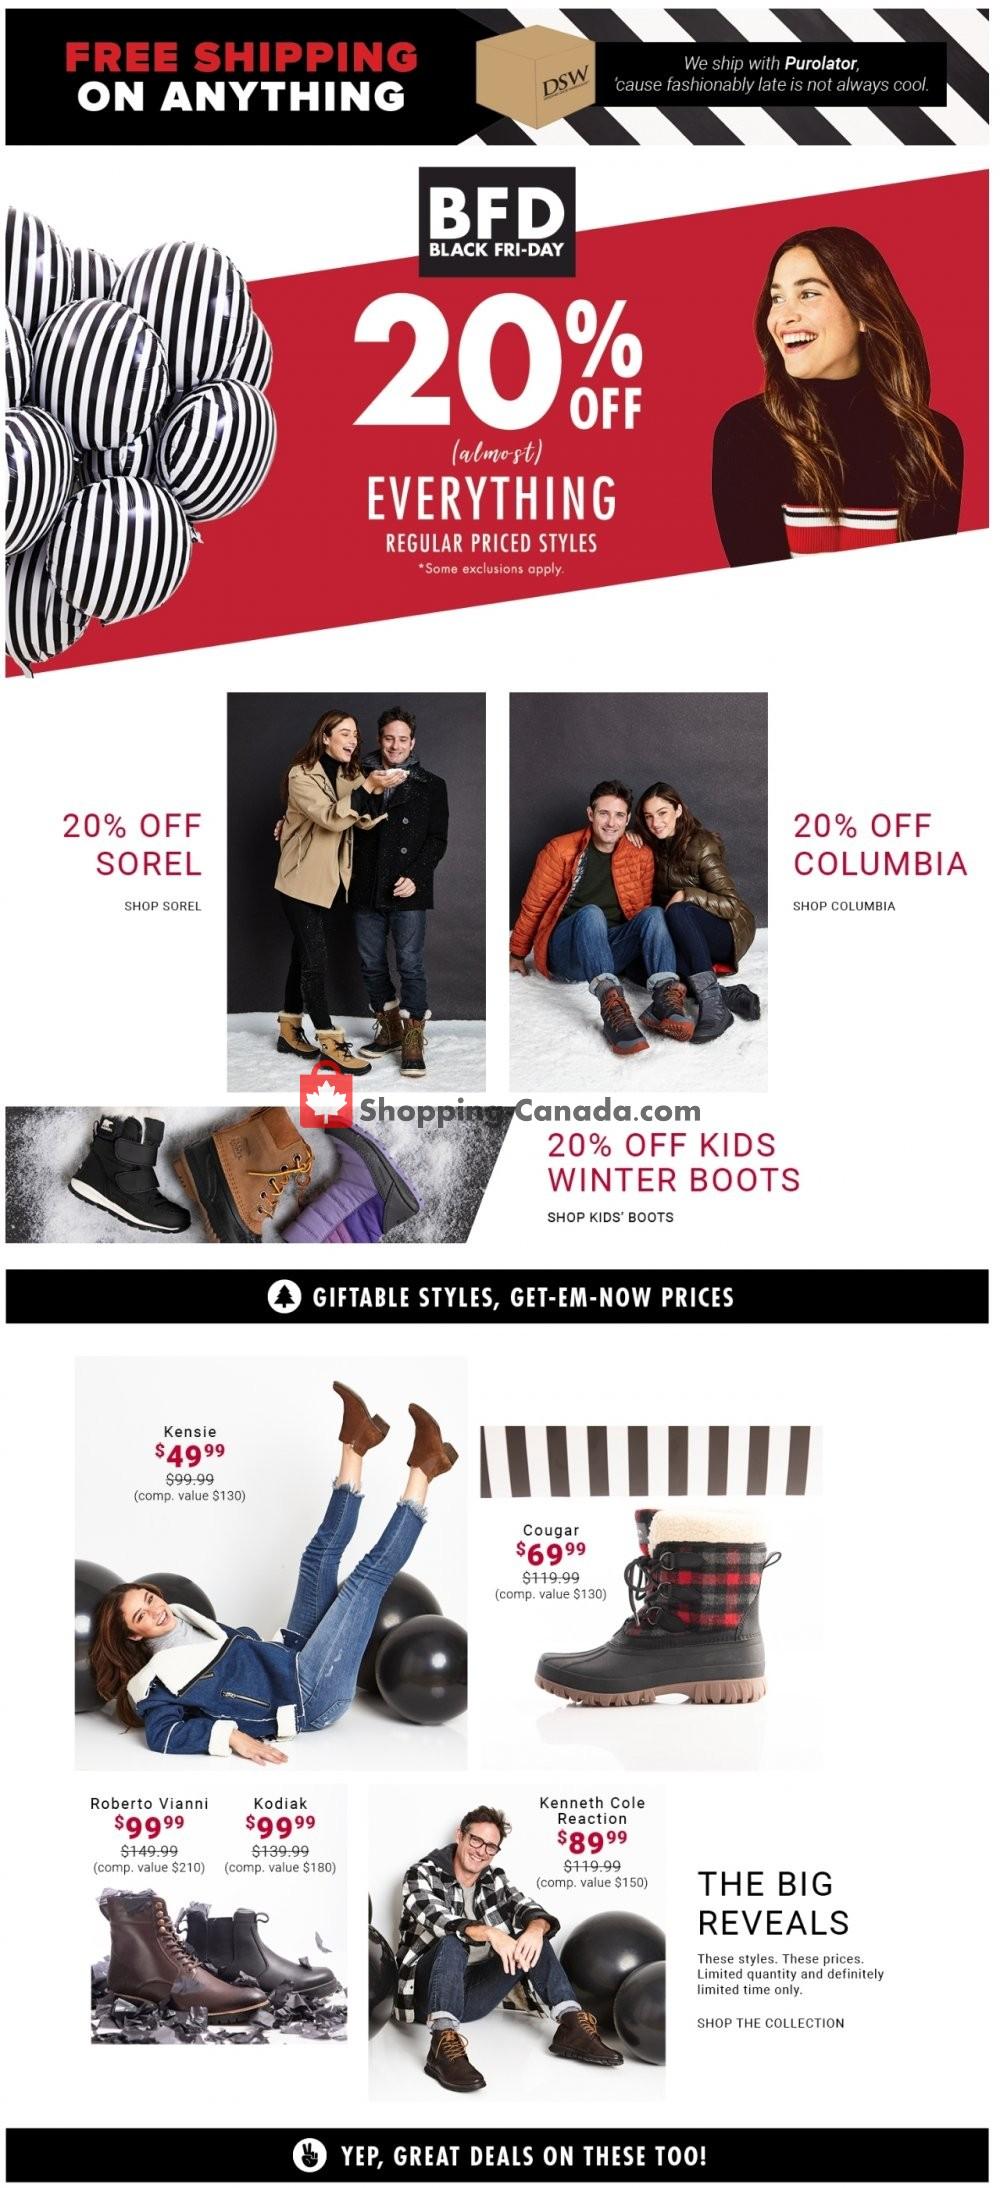 DSW Designer Shoe Warehouse Canada